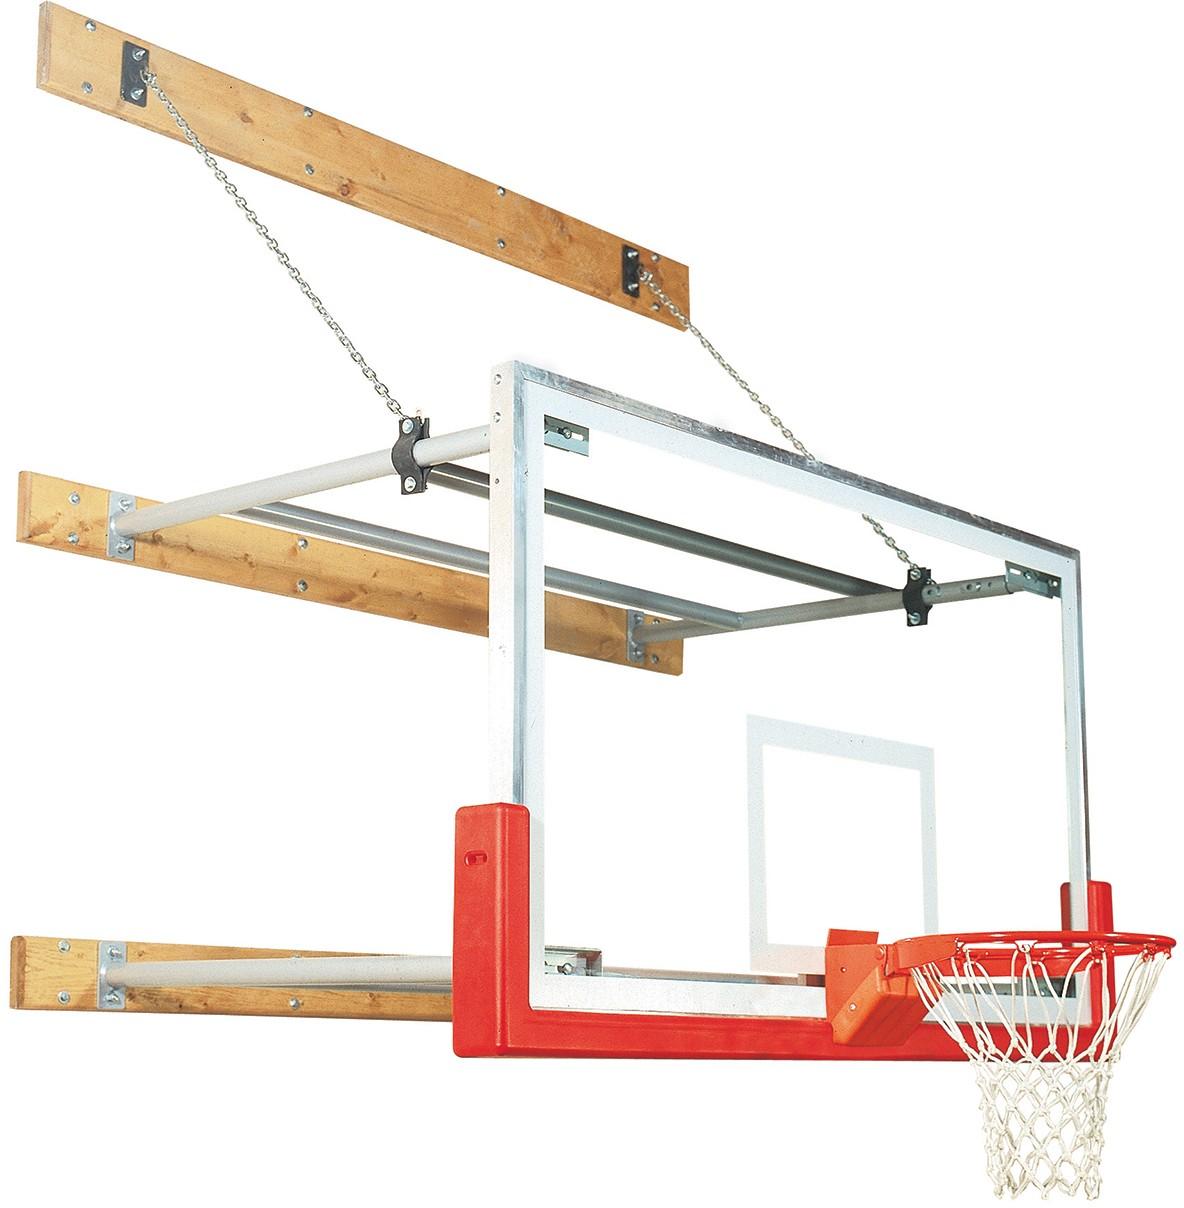 Bison Wall Mounted Basketball Hoop w/ Glass Backboard, 8'-12' EXTENSION - Bison Wall Mounted Basketball Hoop W/ Glass Backboard, 8'-12